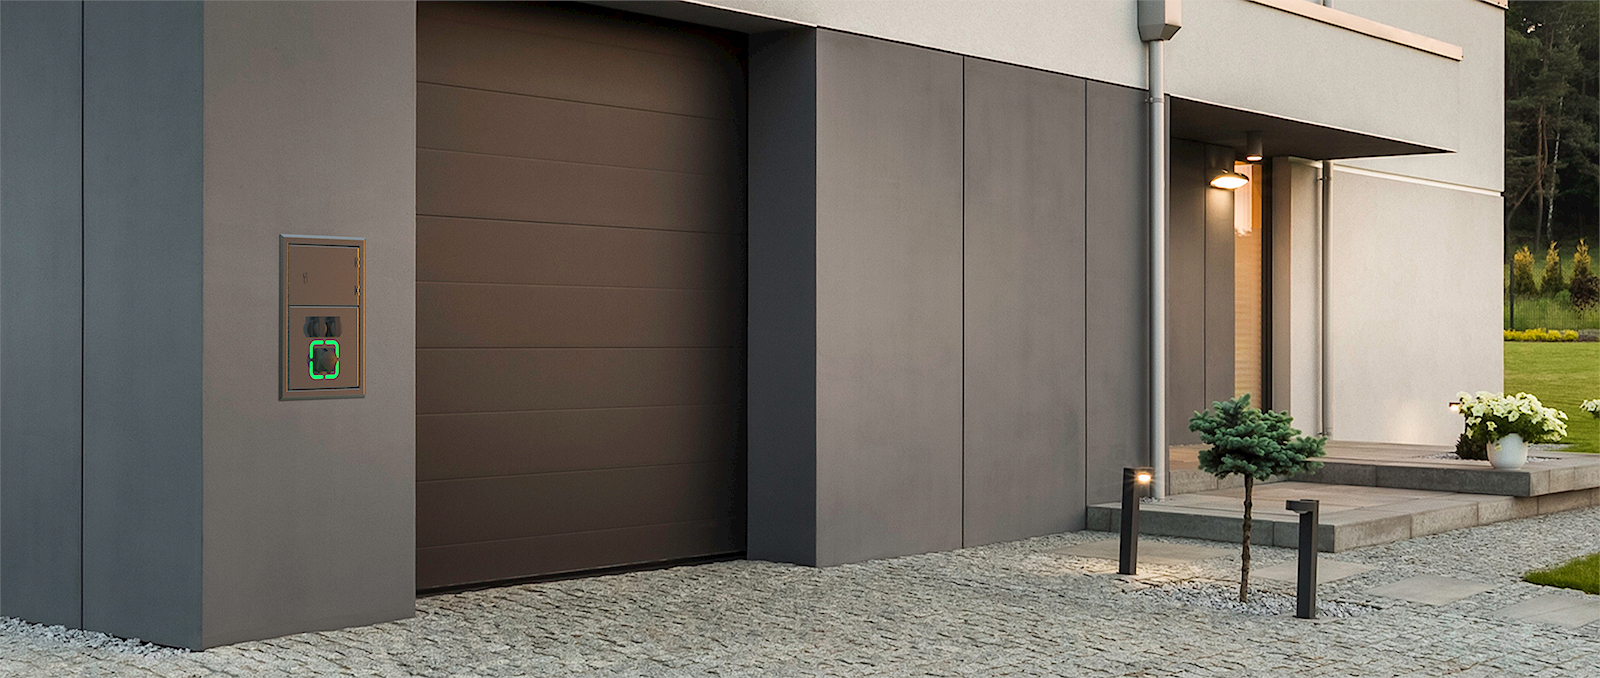 5801-Wandverteiler-an-der-Hauswand-Banner-1600×678